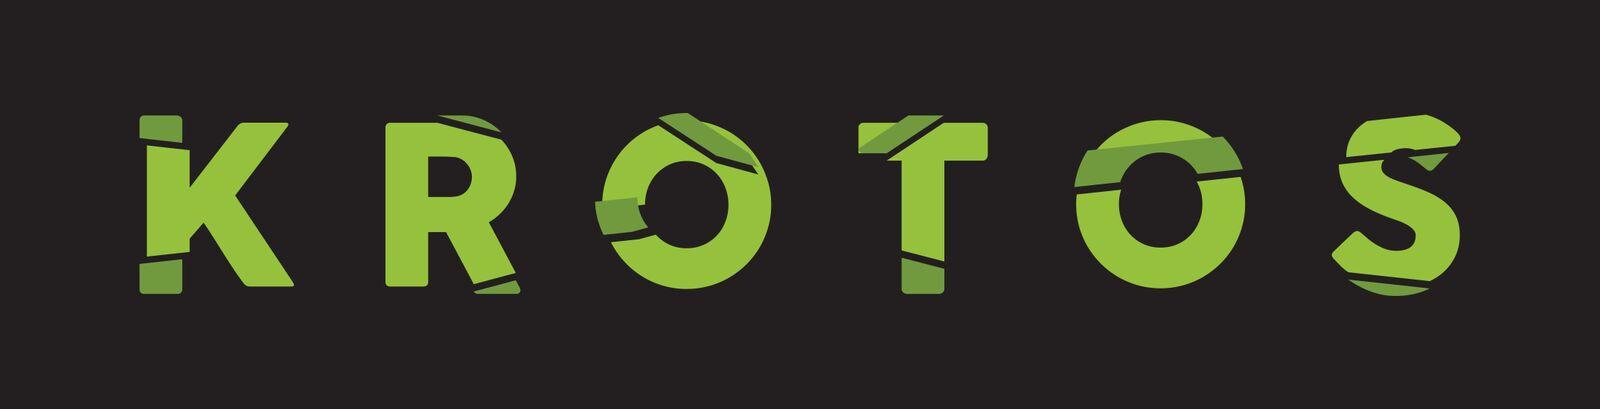 KR-logo-green-b_preview.jpeg